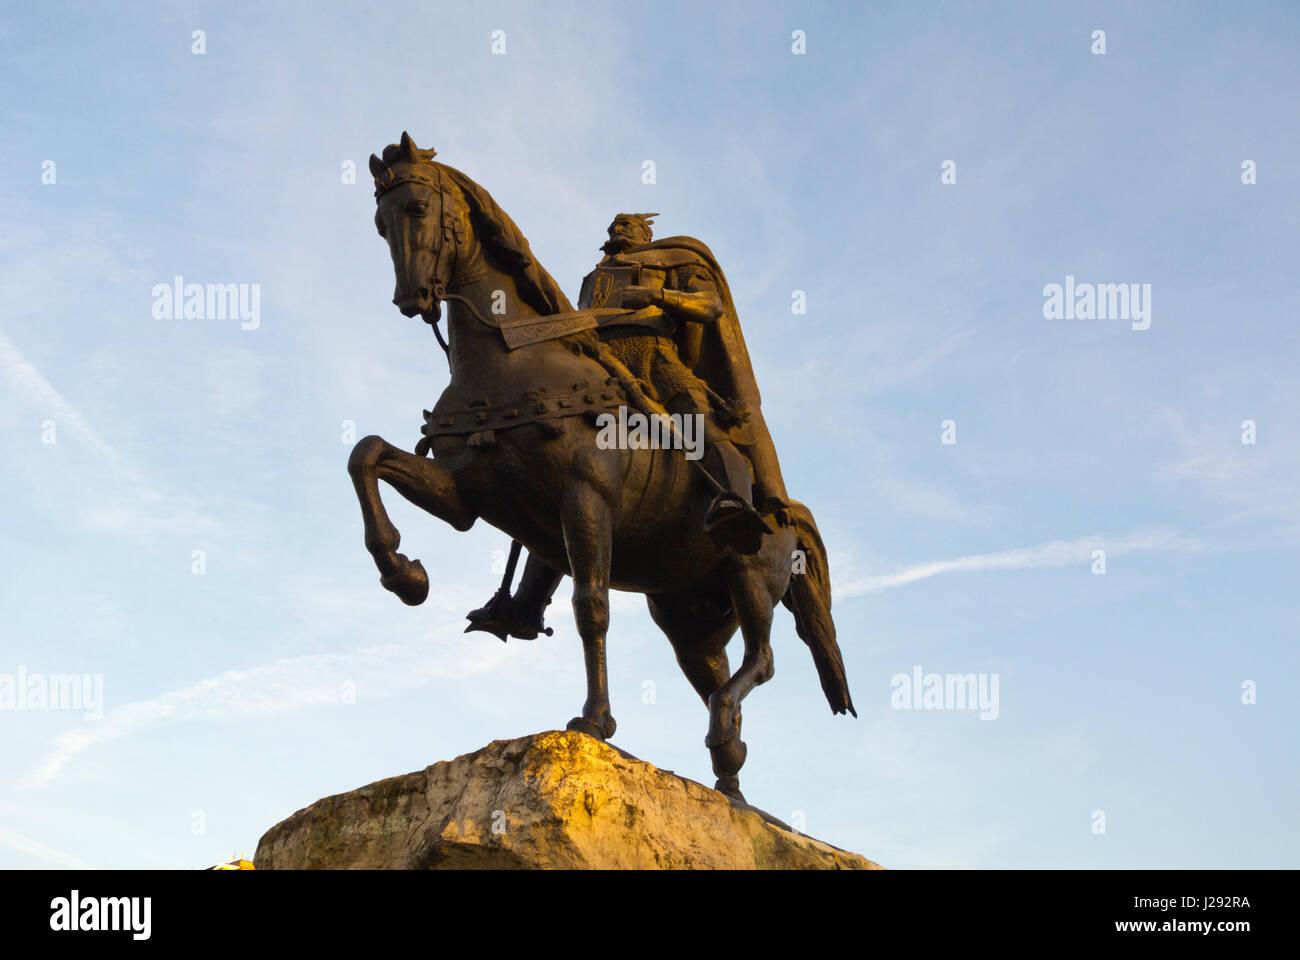 Skanderbeg, George Castriot, Lord of Albania, memorial sculpture, Tirana, Albania - Stock Image